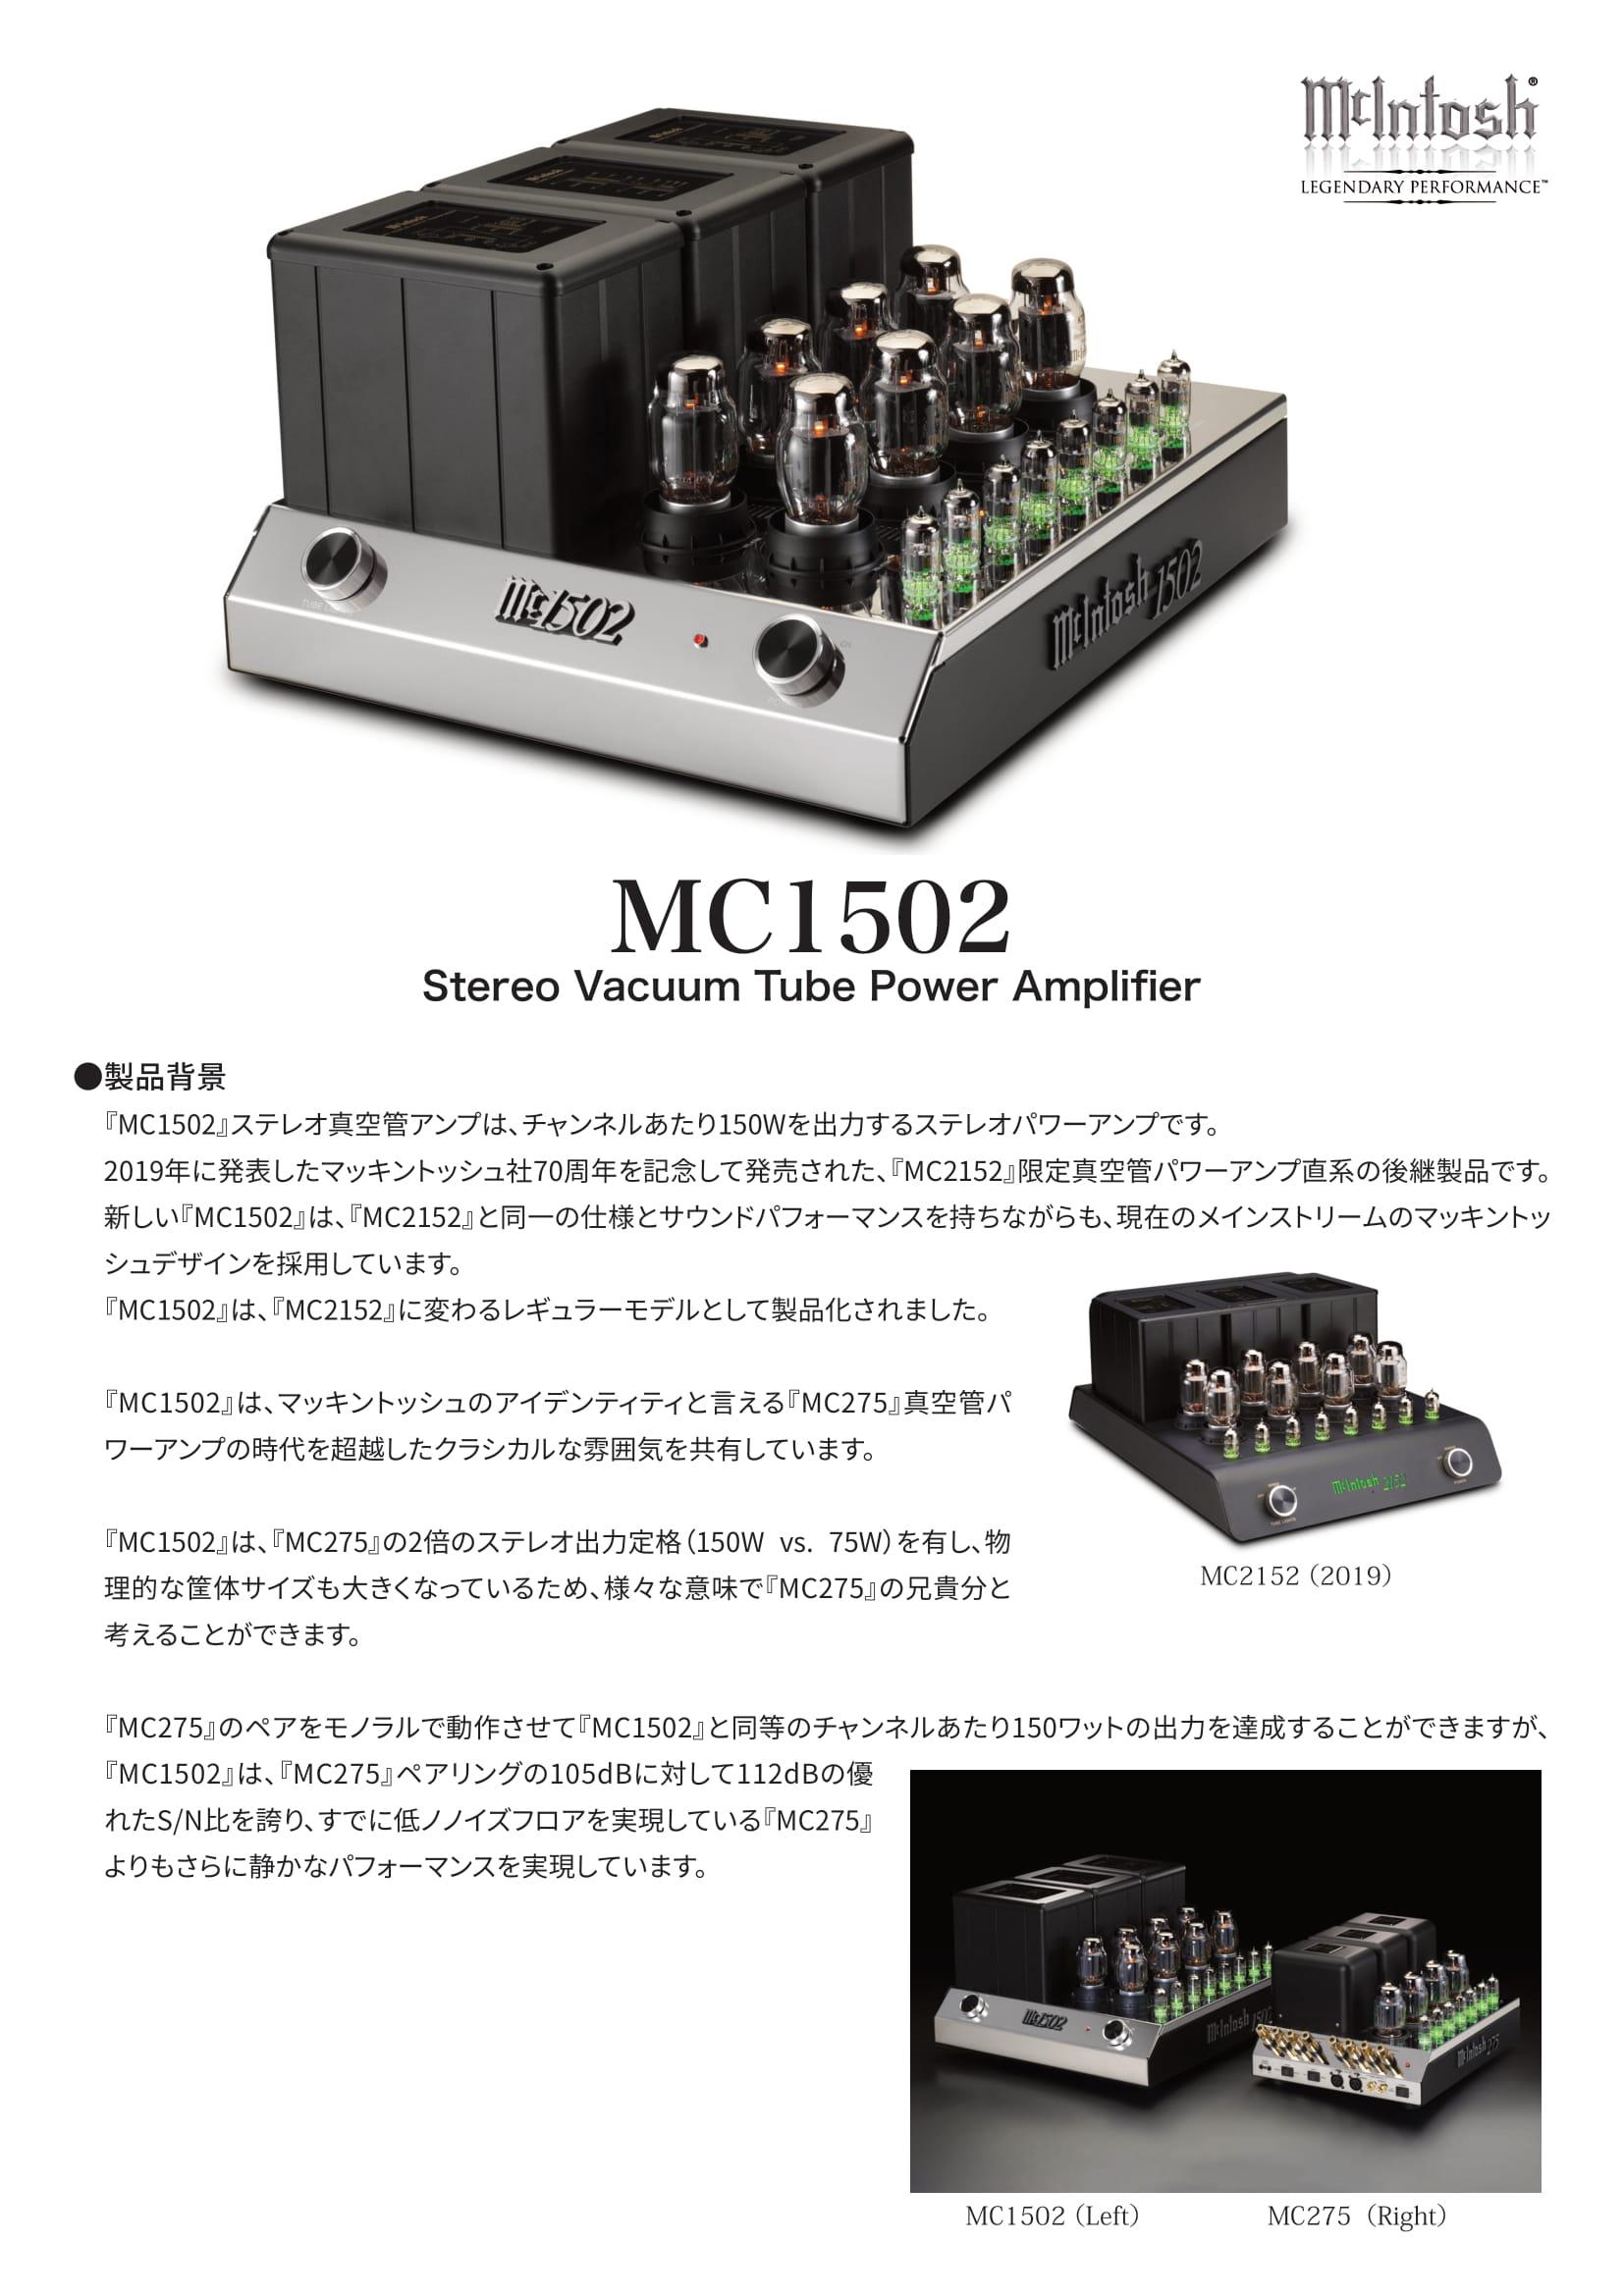 McIntosh_5-1.jpg